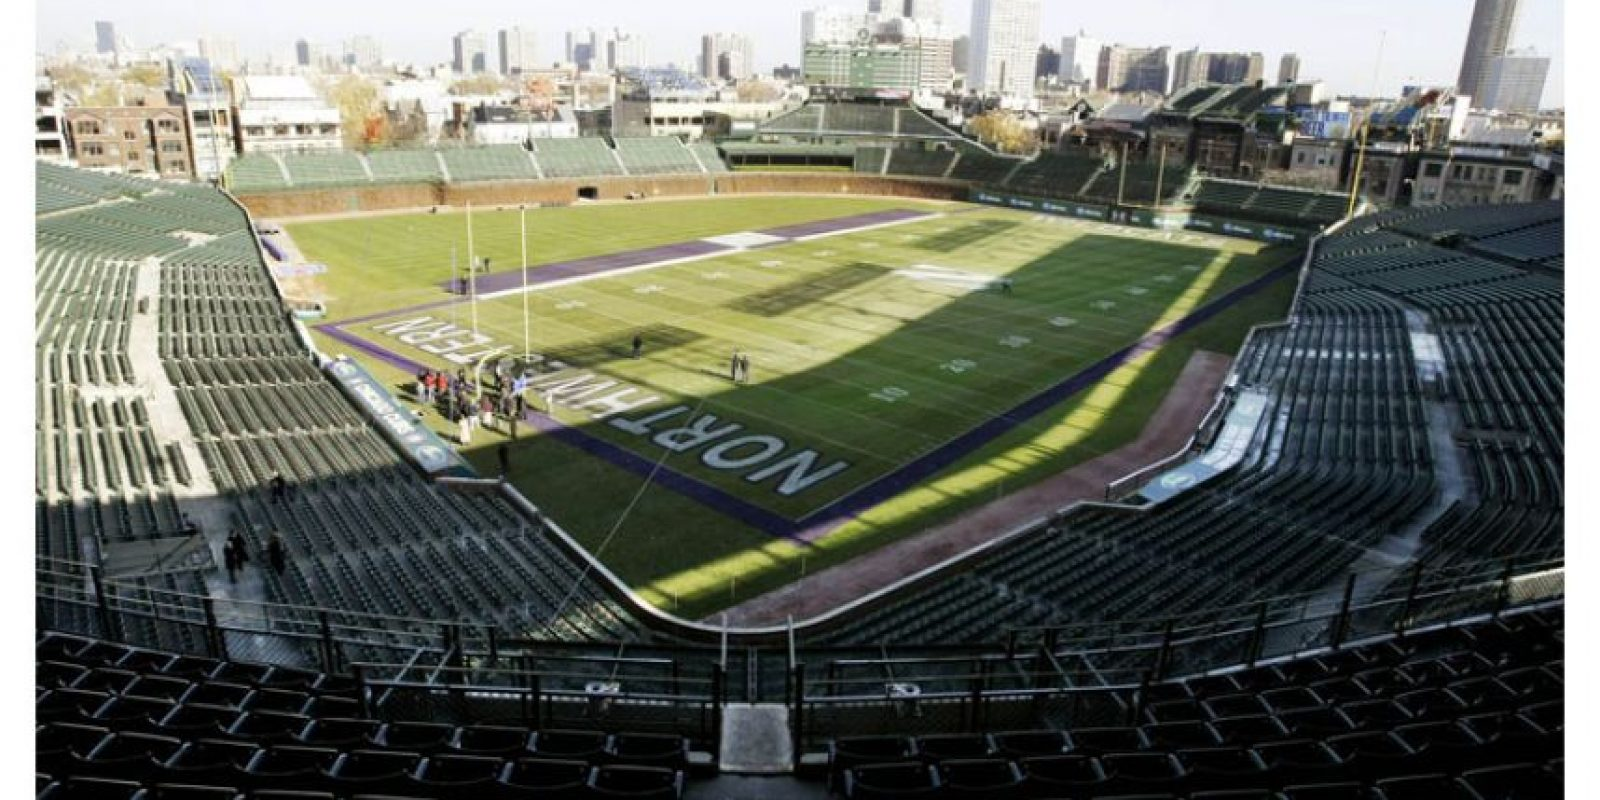 Fútbol Americano, Wrigley Field, Chicago